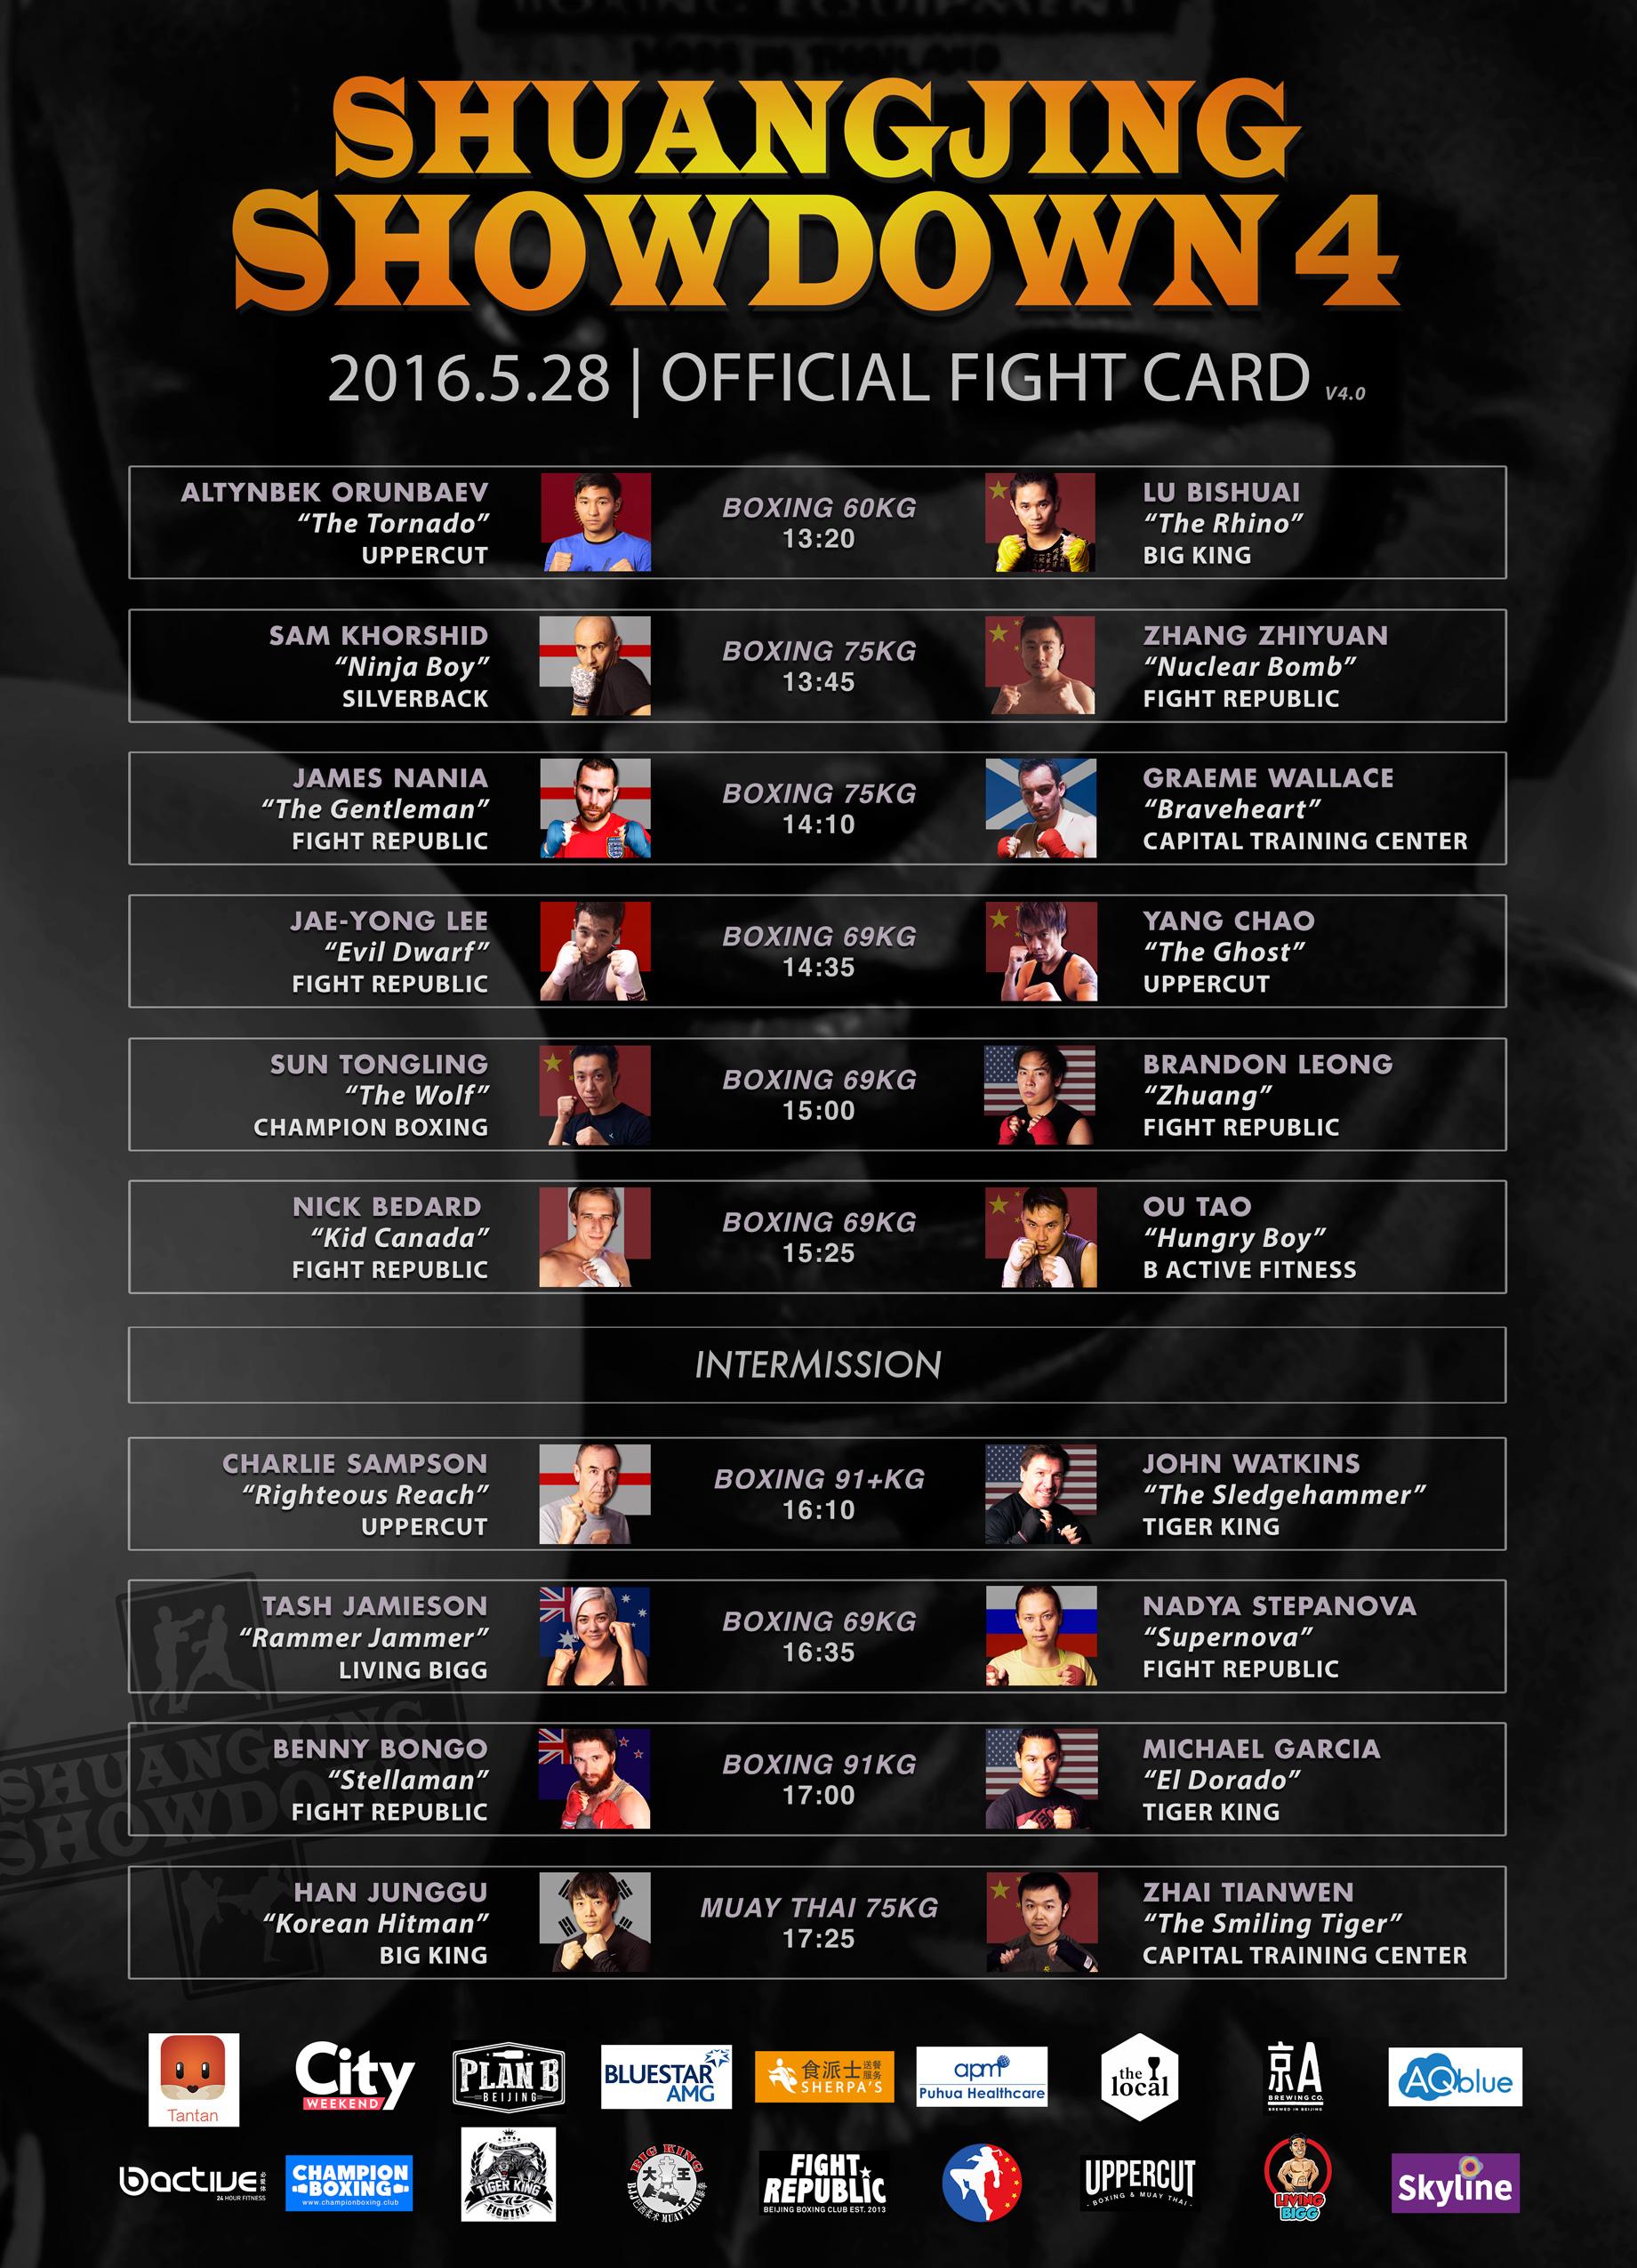 SS4_Fight_Card_Times_06_WEB.jpg